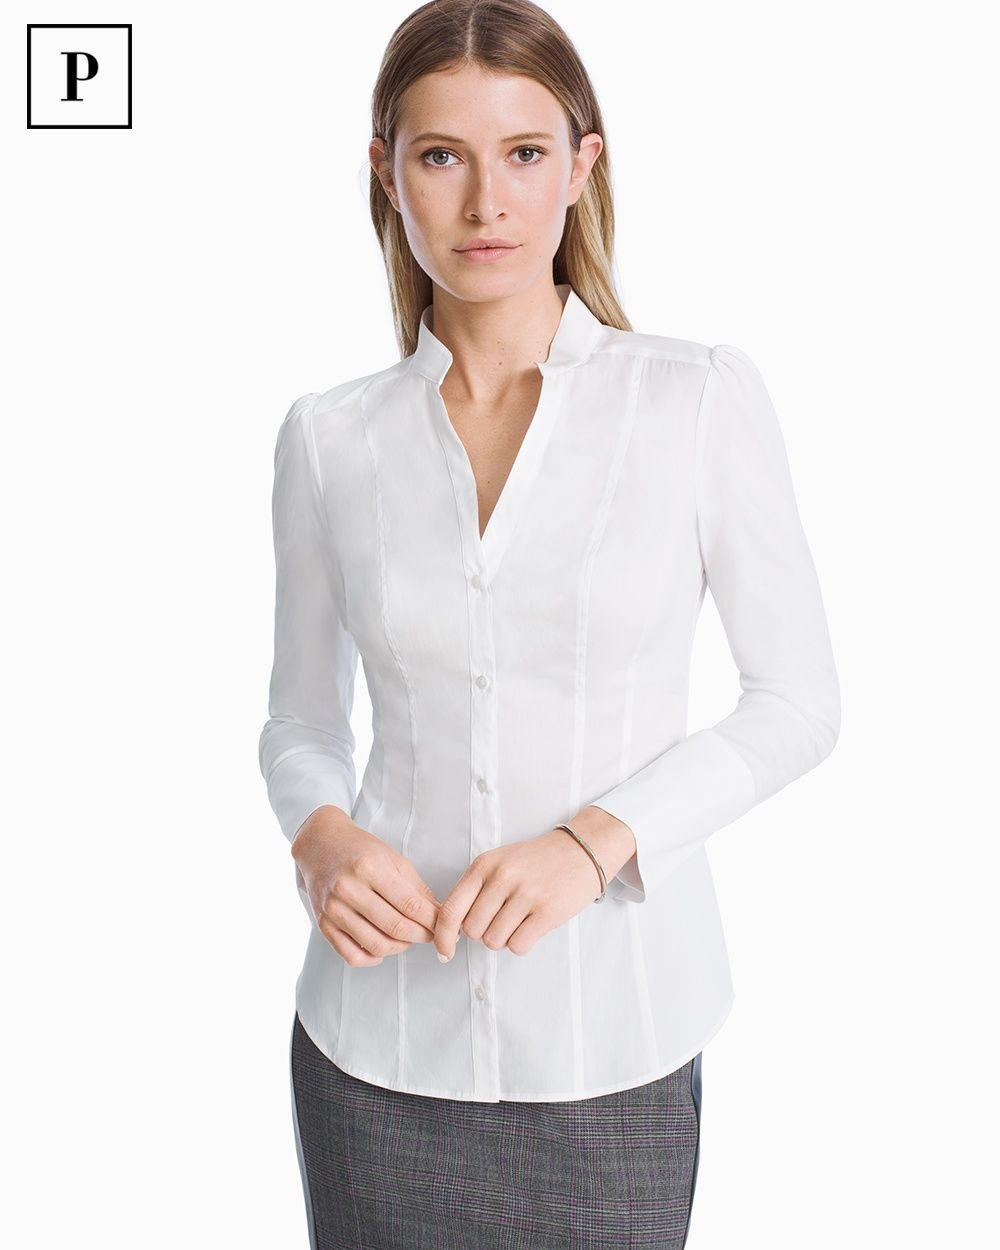 6f2b70660f8e5 Women s Petite Basic Poplin Shirt by WHBM